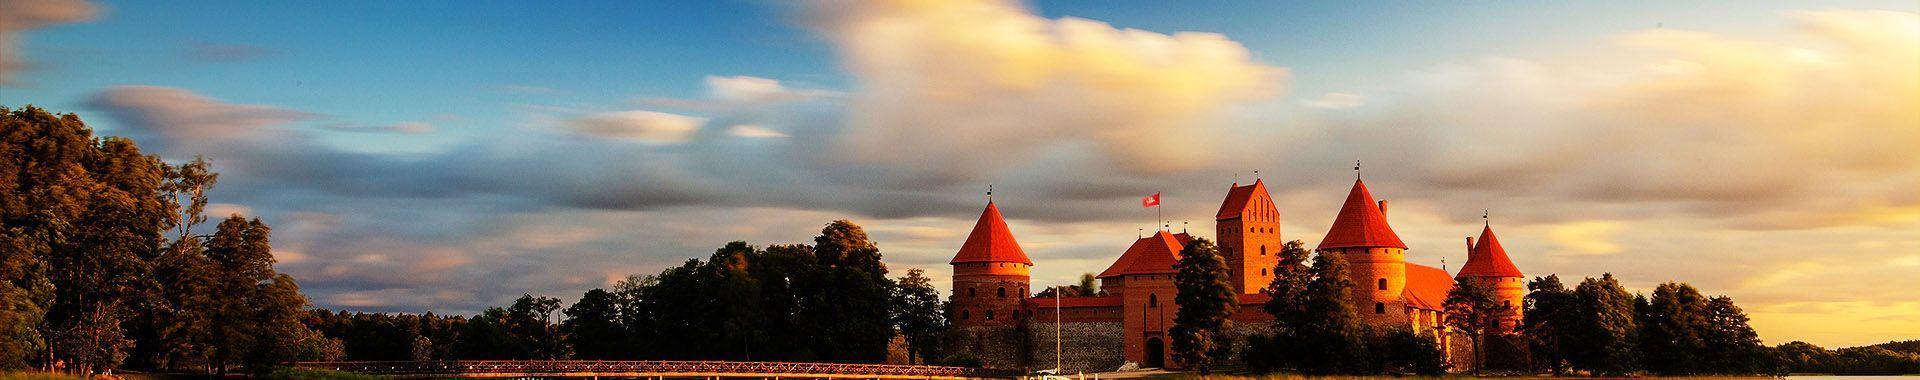 kolory flagi litewskiej